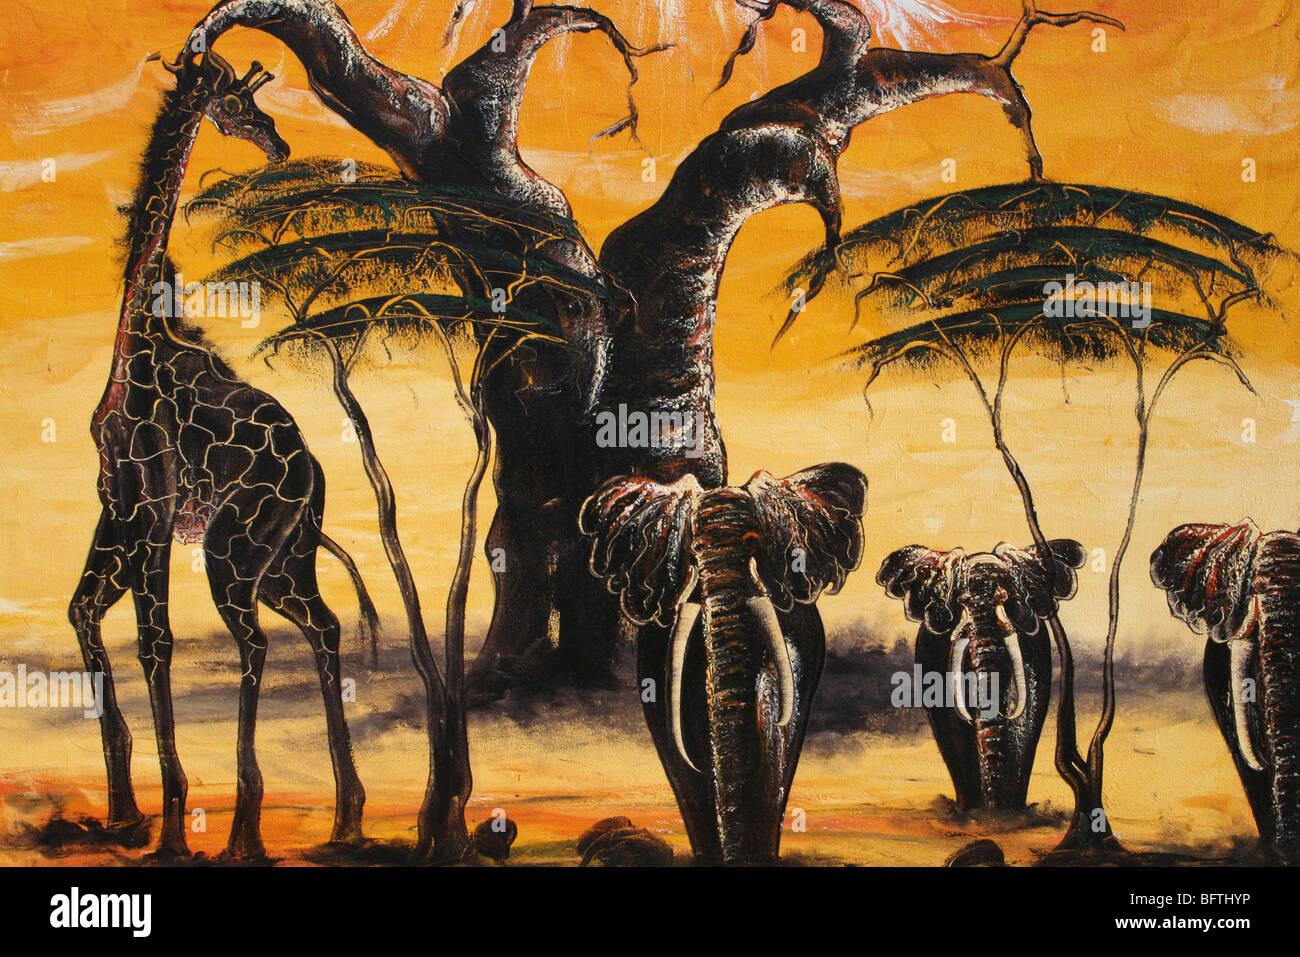 Traditional African Wildlife Painting Taken In Mto Wa Mbu, Tanzania - Stock Image